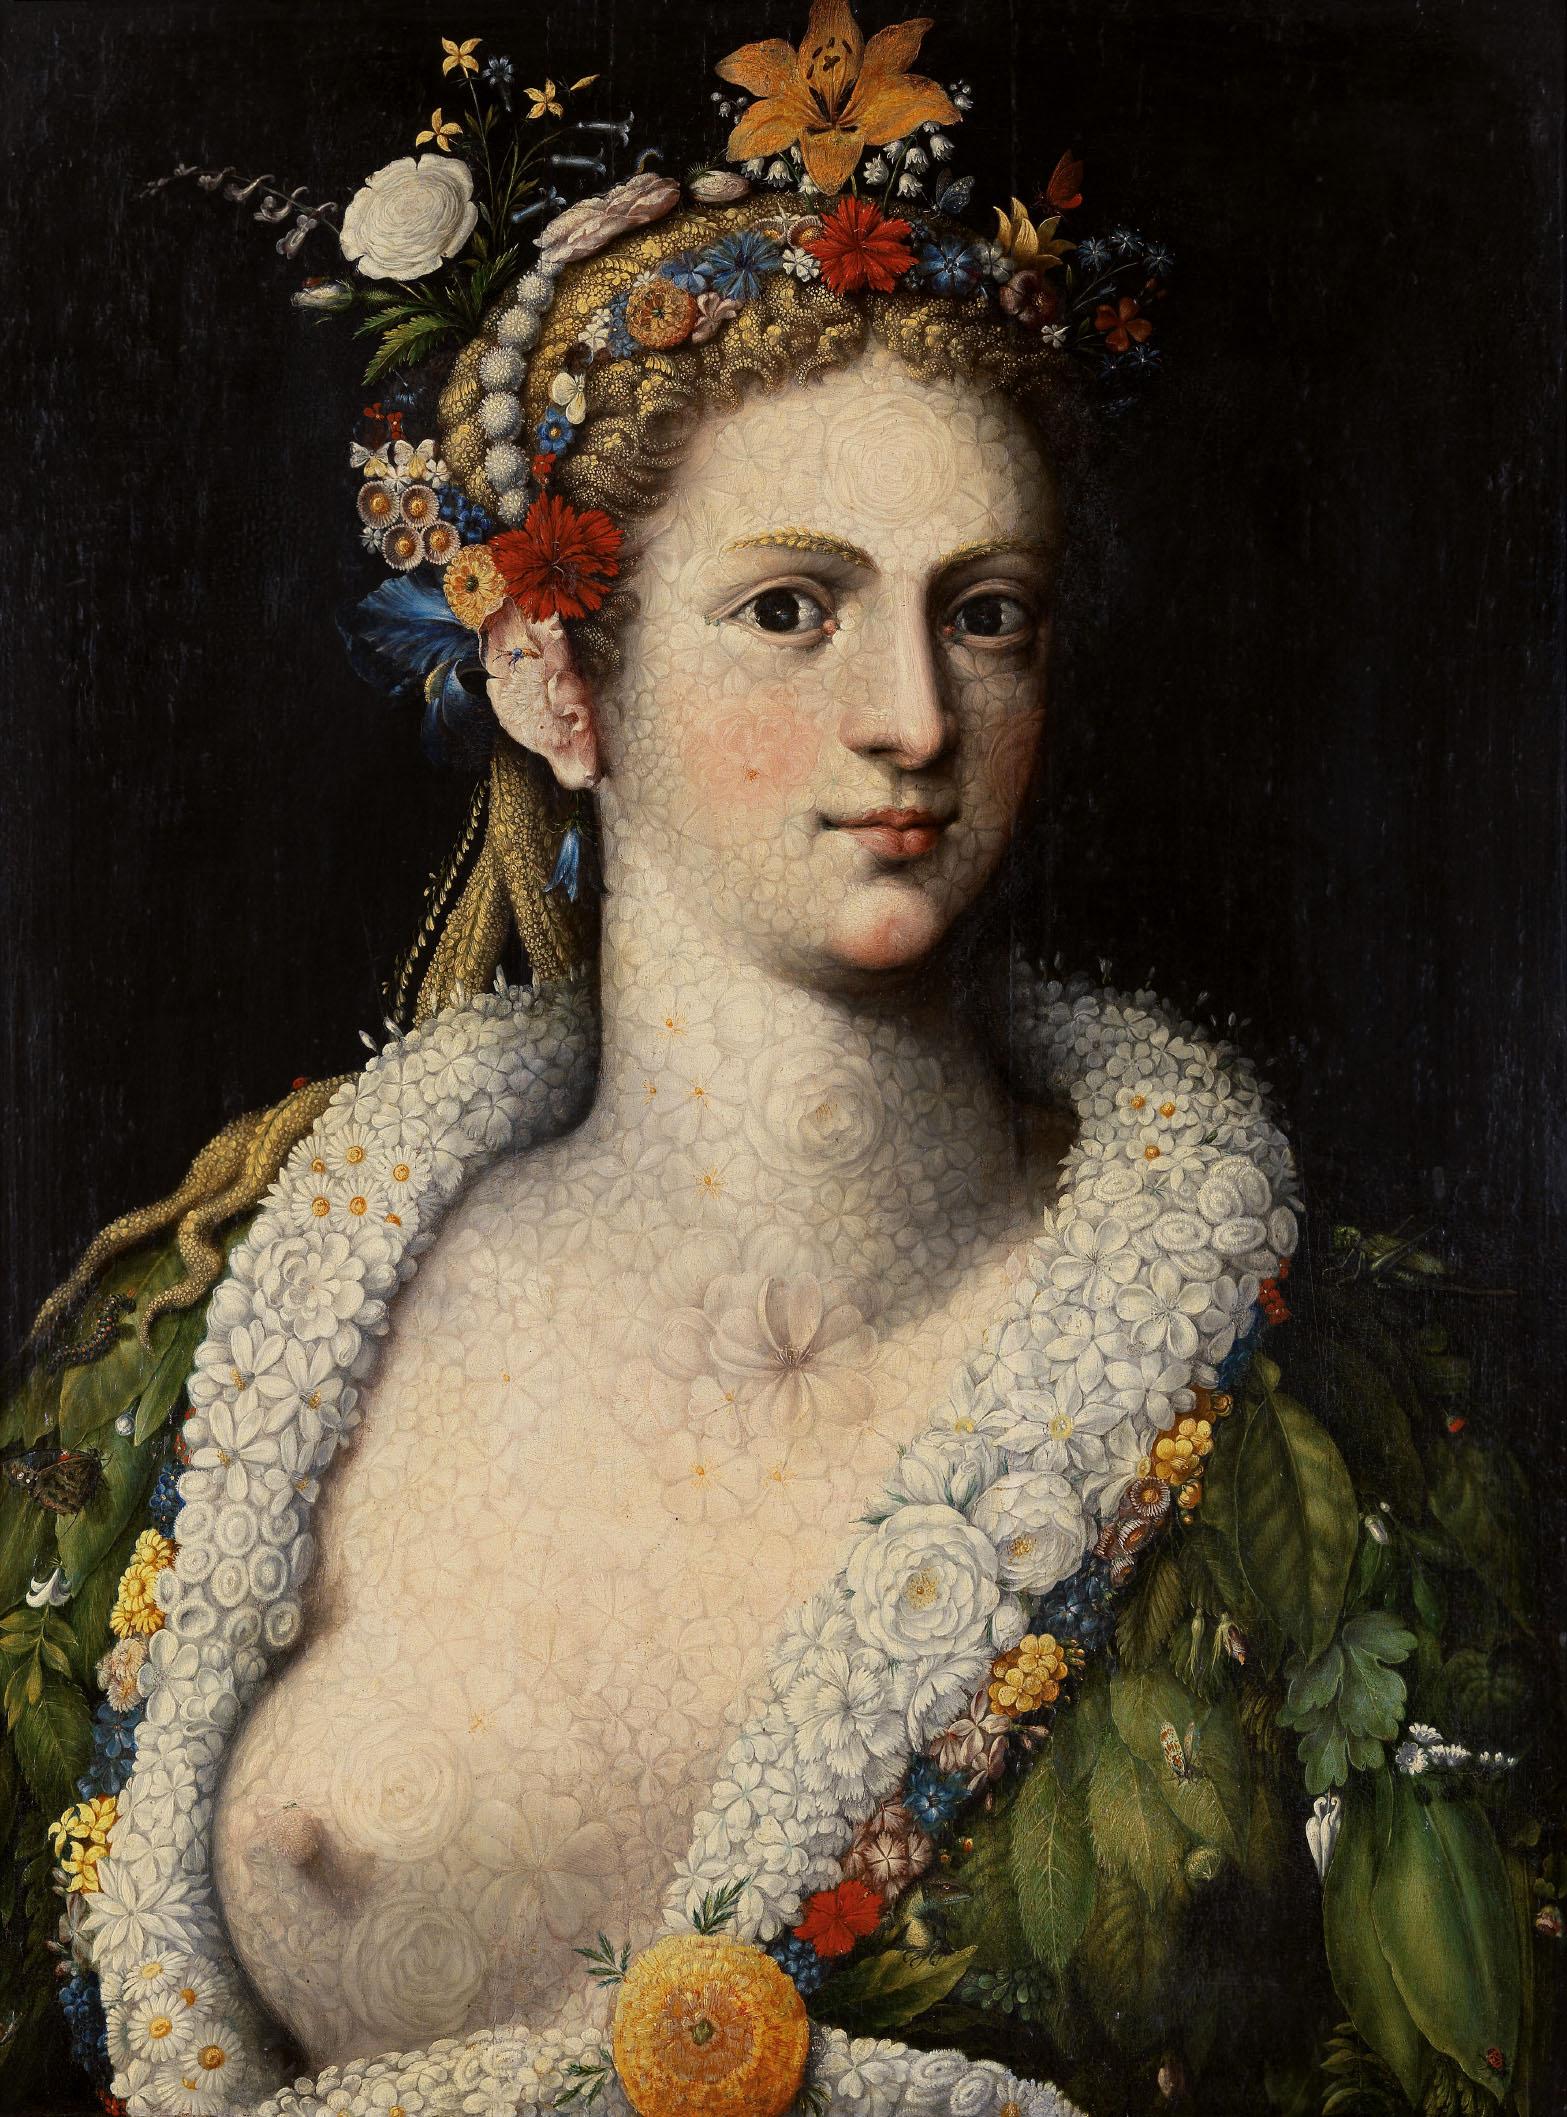 Flora Meretrix 1590 by Giuseppe Arcrimboldo